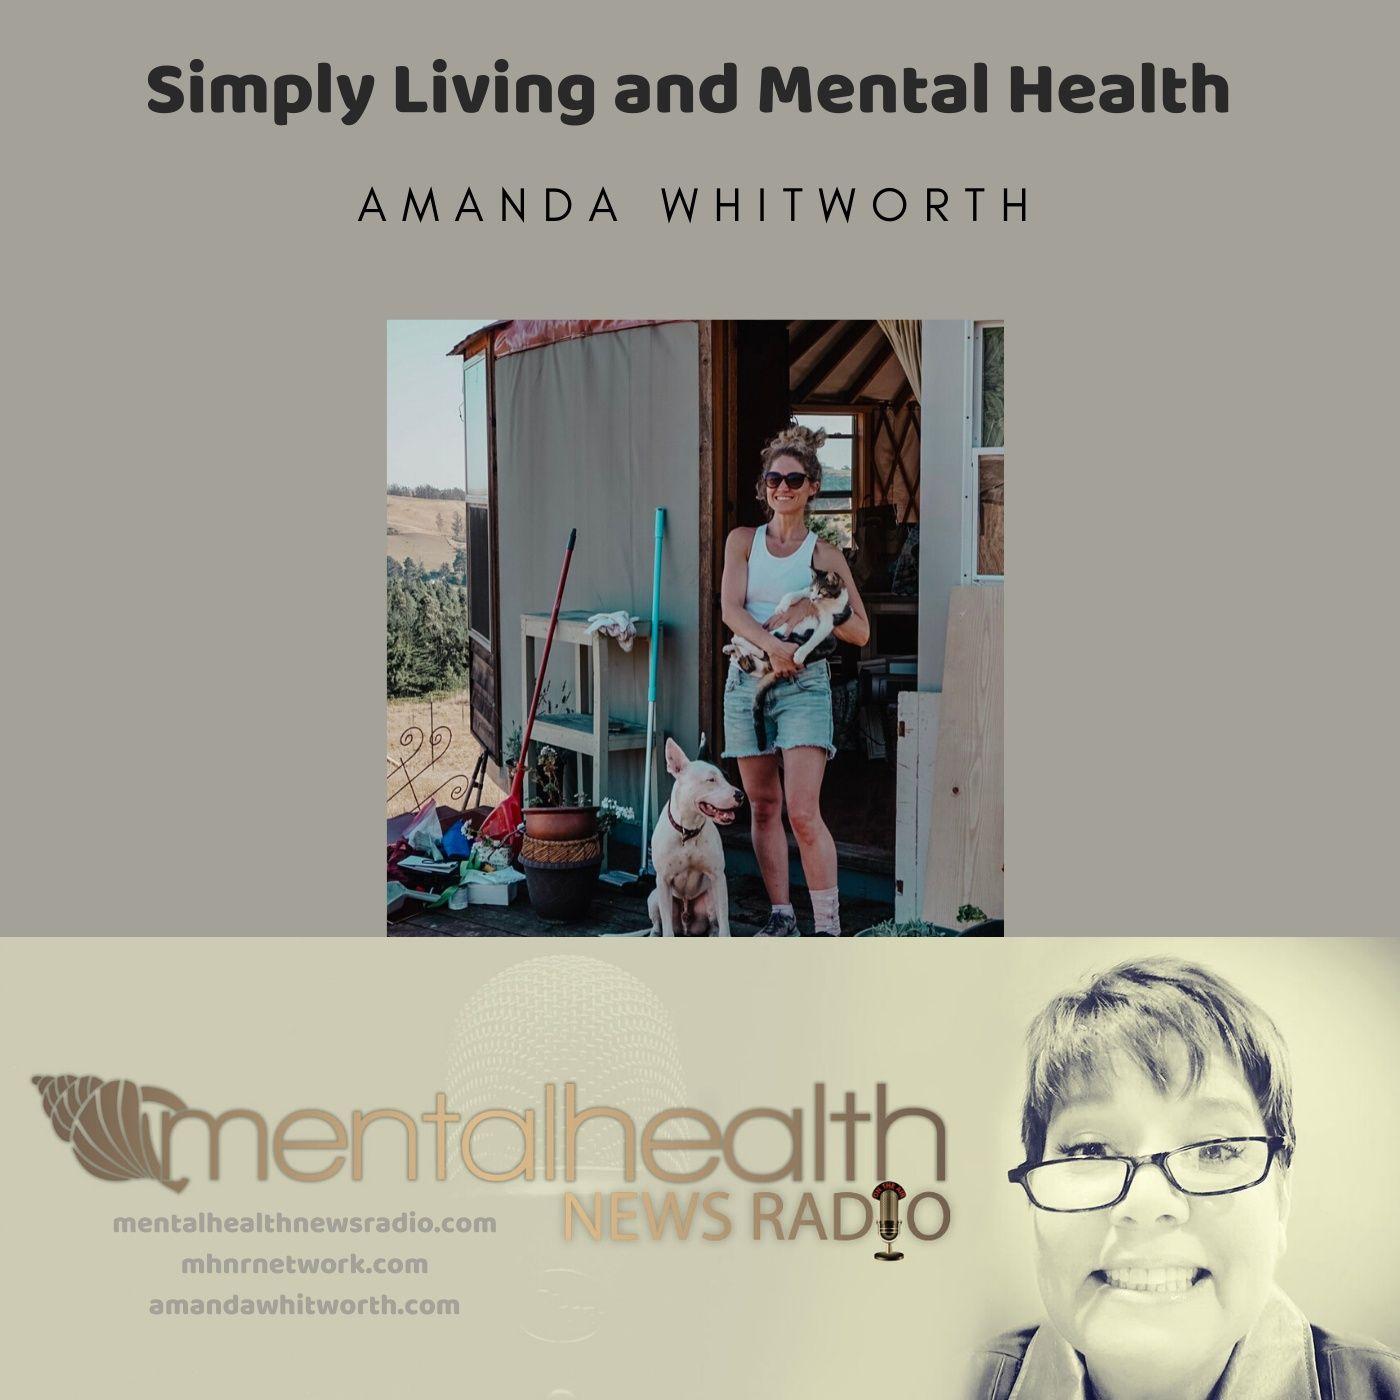 Mental Health News Radio - Simply Living and Mental Health